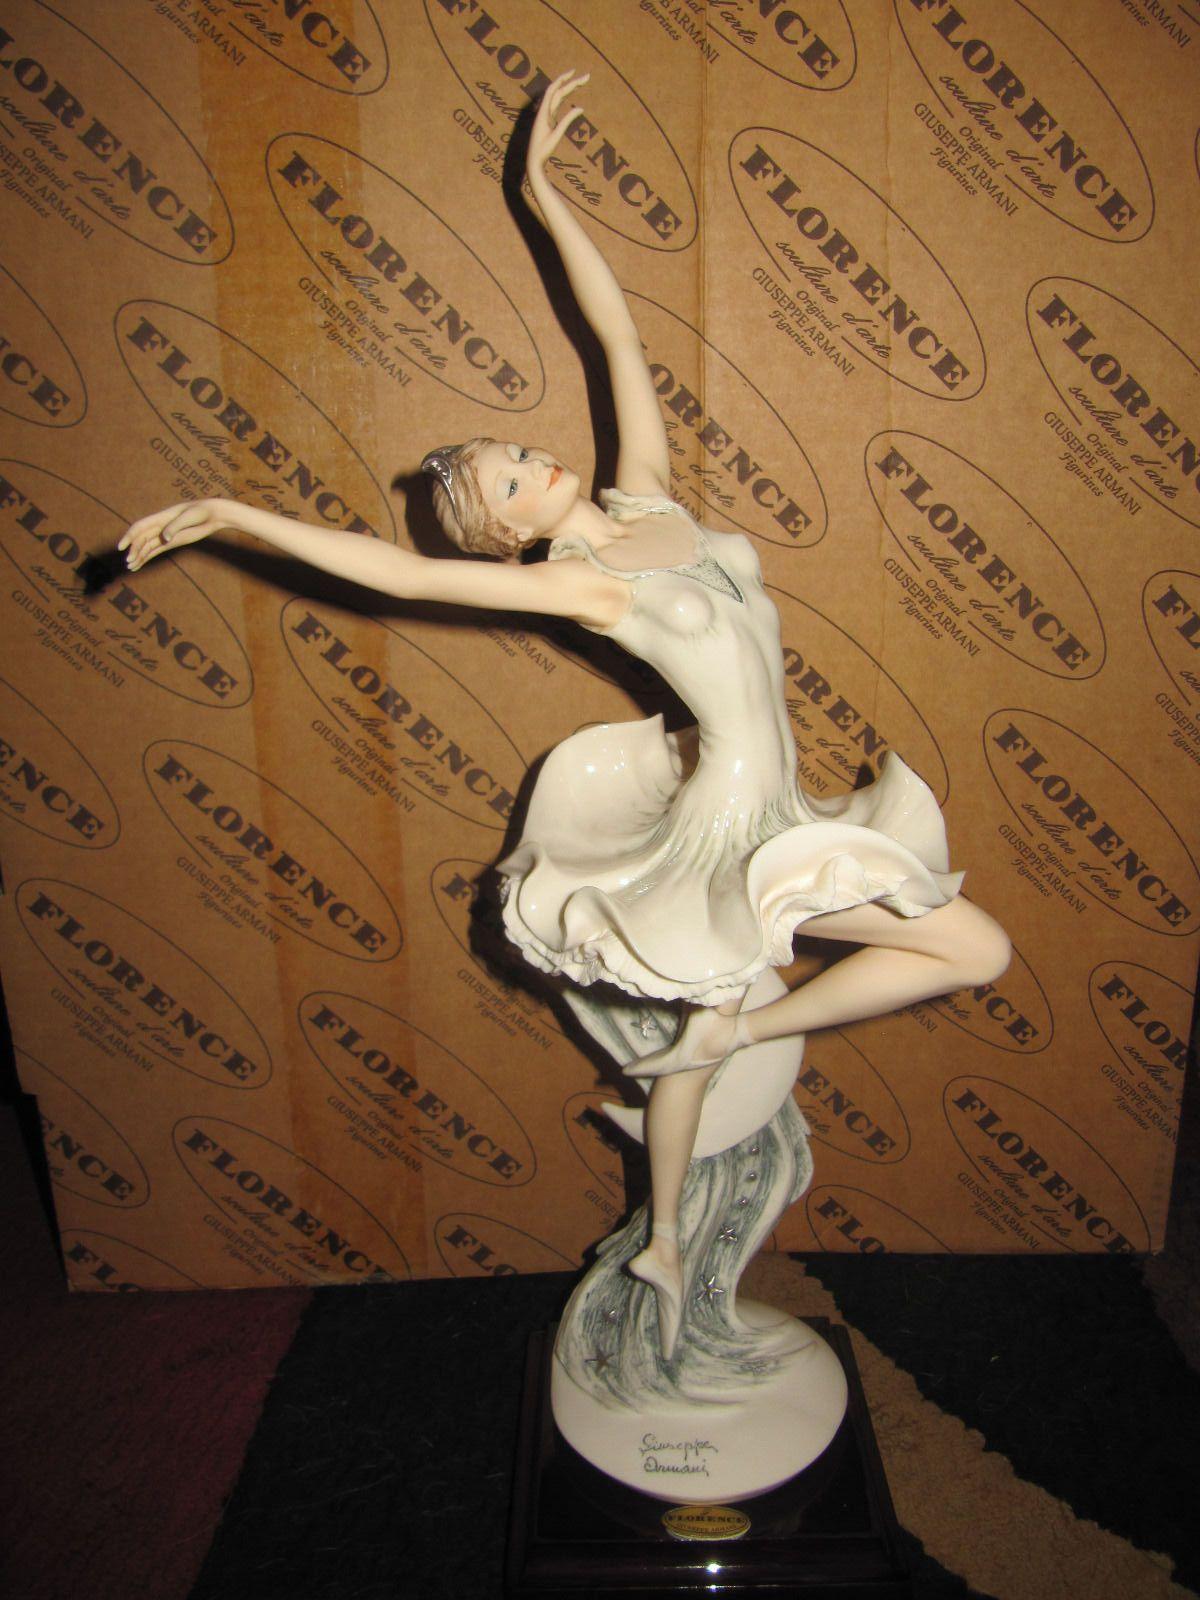 Retired Giuseppe Armani Figurine In Box. Ballerina